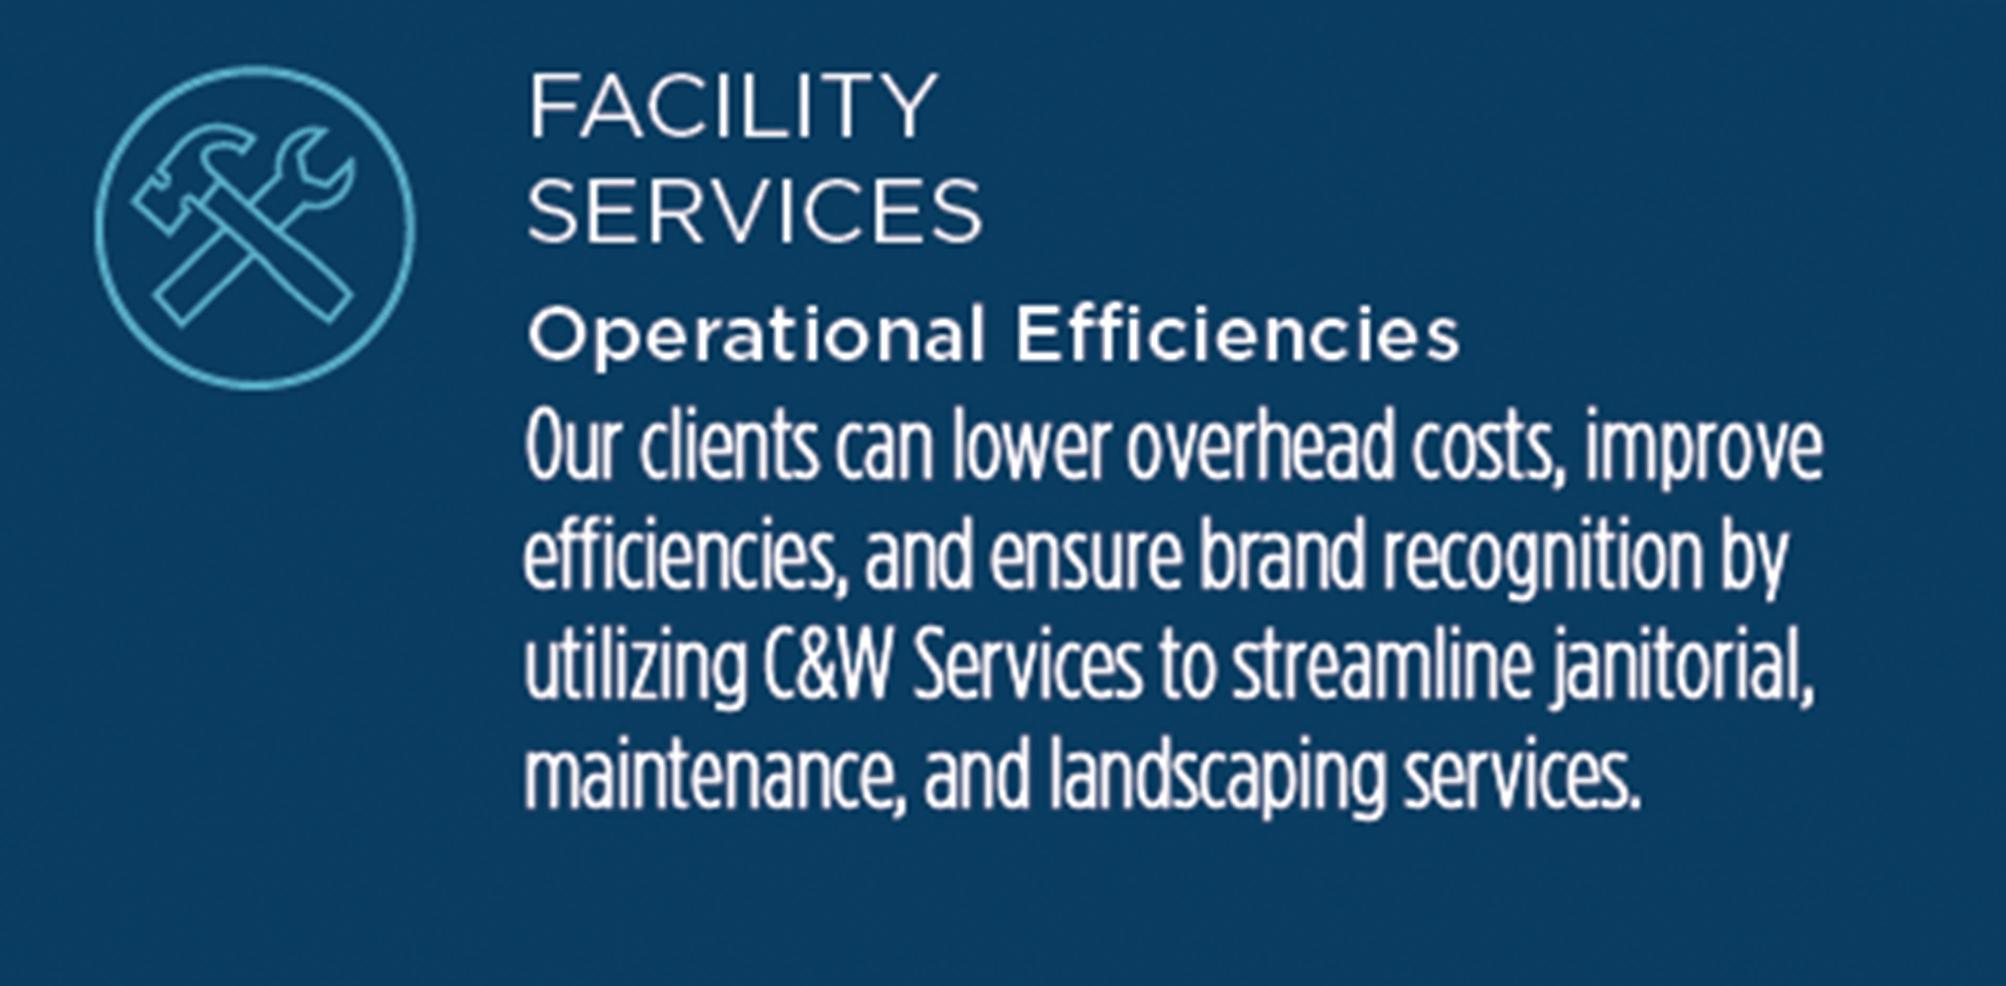 5 Services